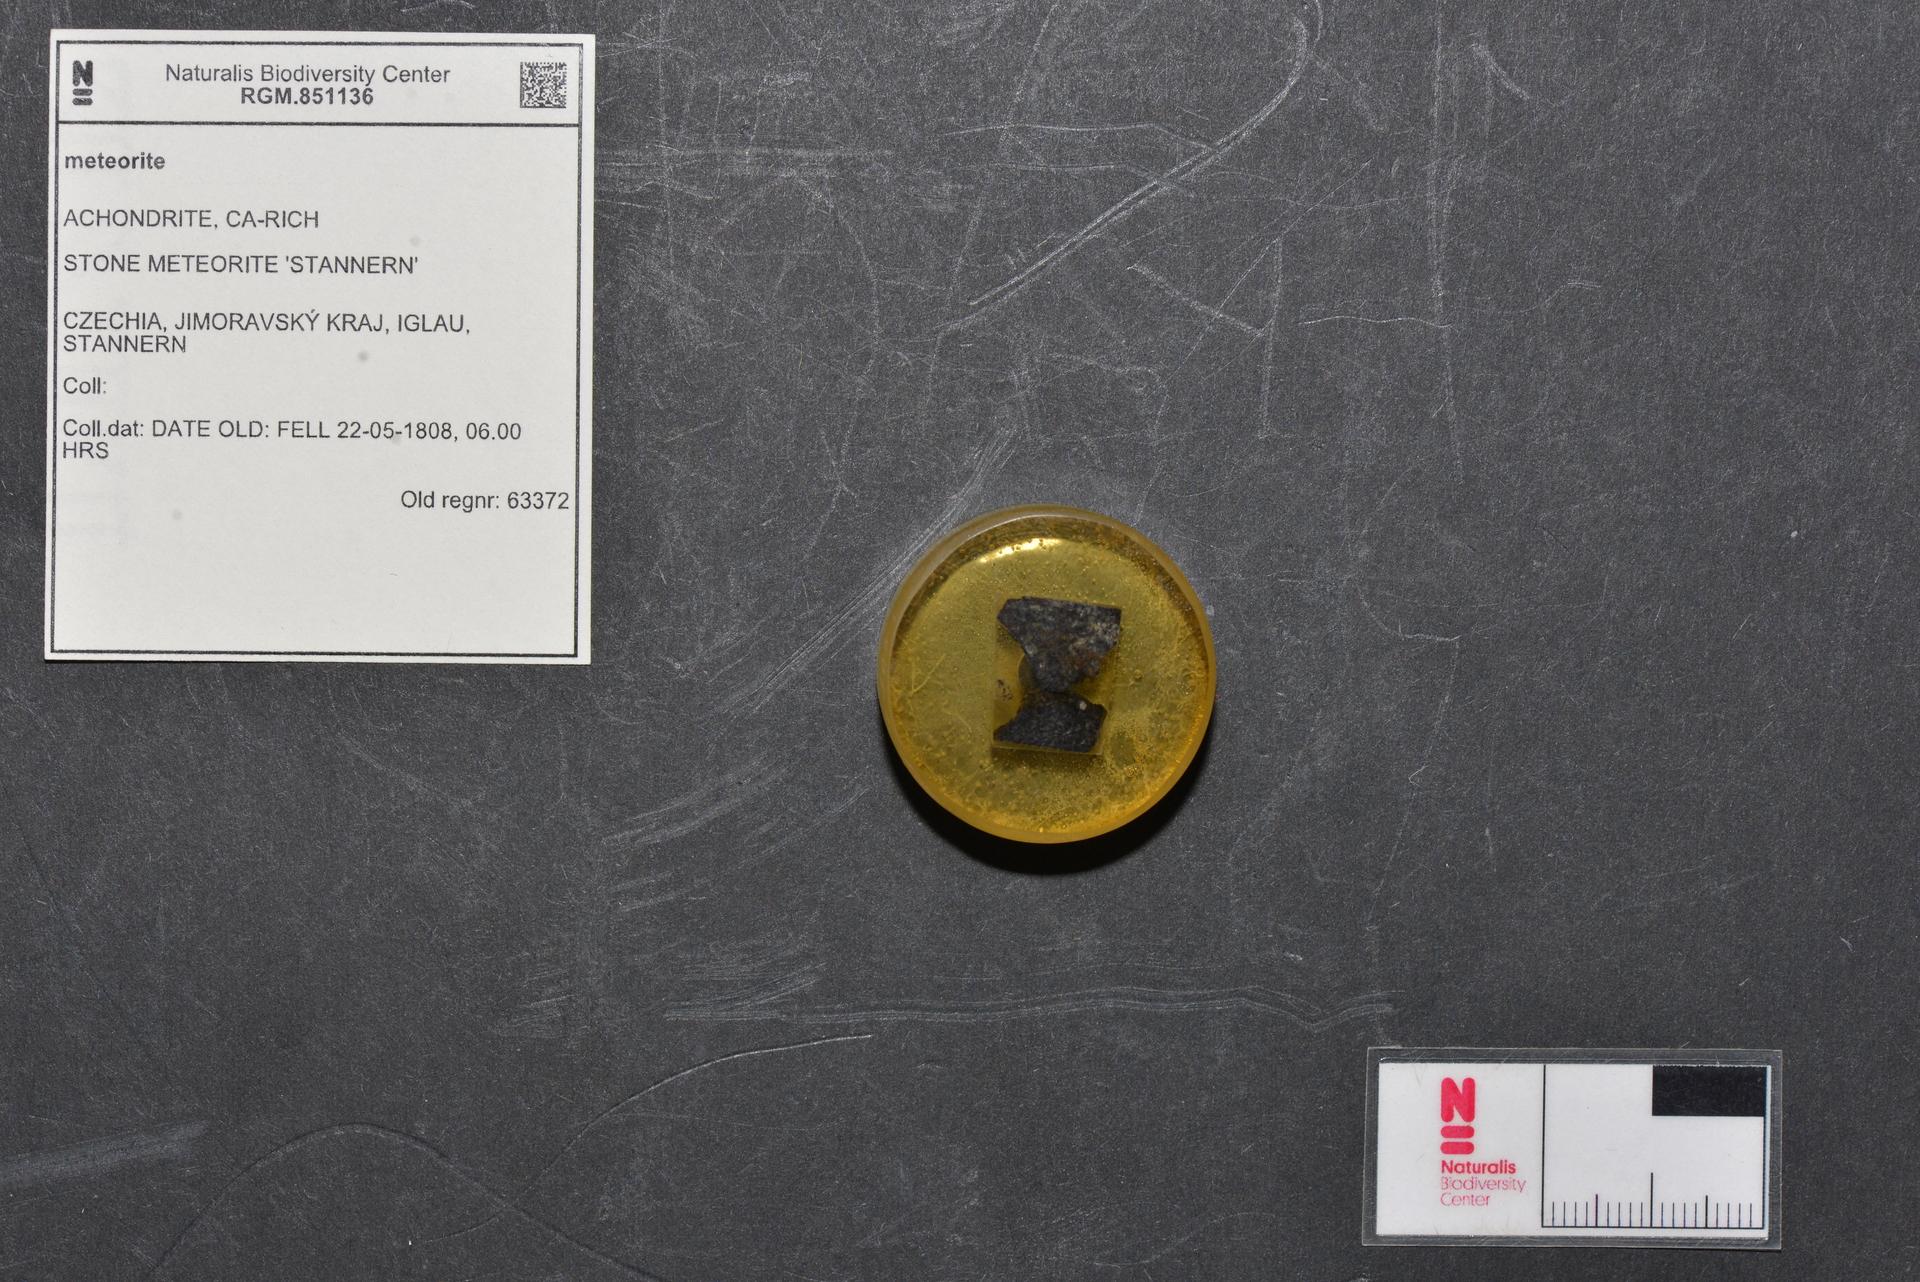 RGM.851136 | Eucrite-mmict